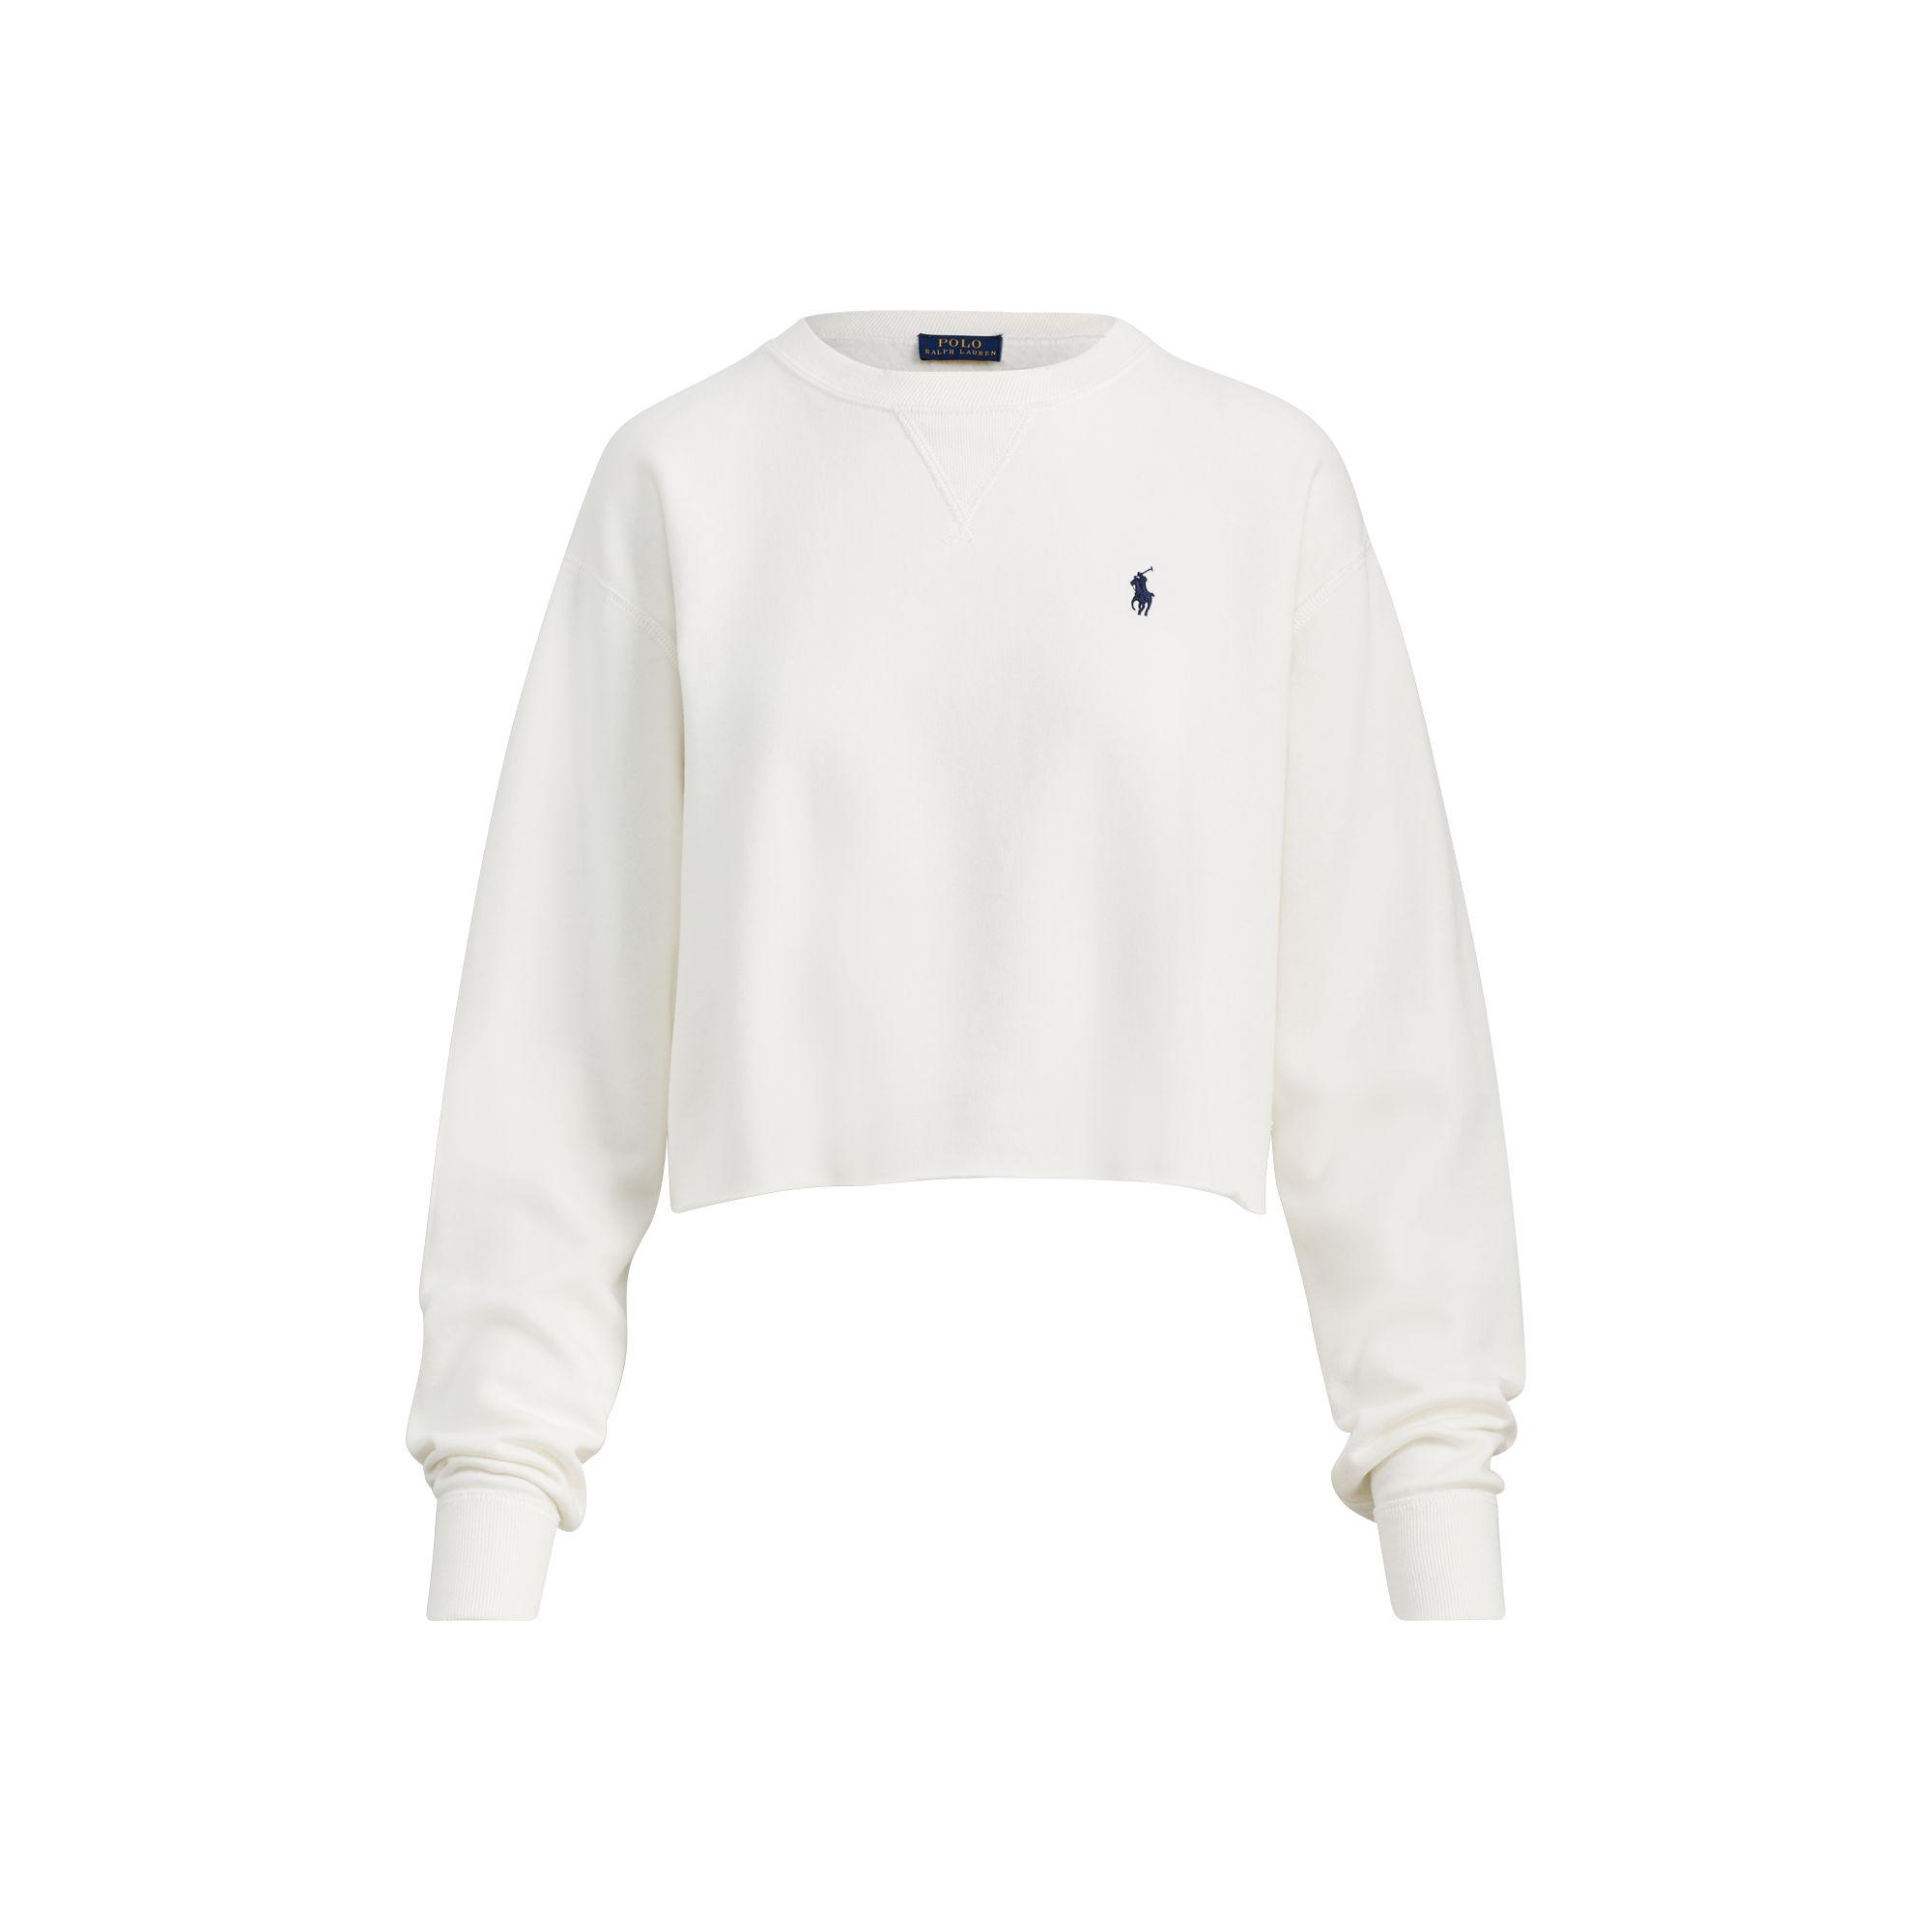 Polo Ralph Lauren. Women's White Cropped Fleece Sweatshirt